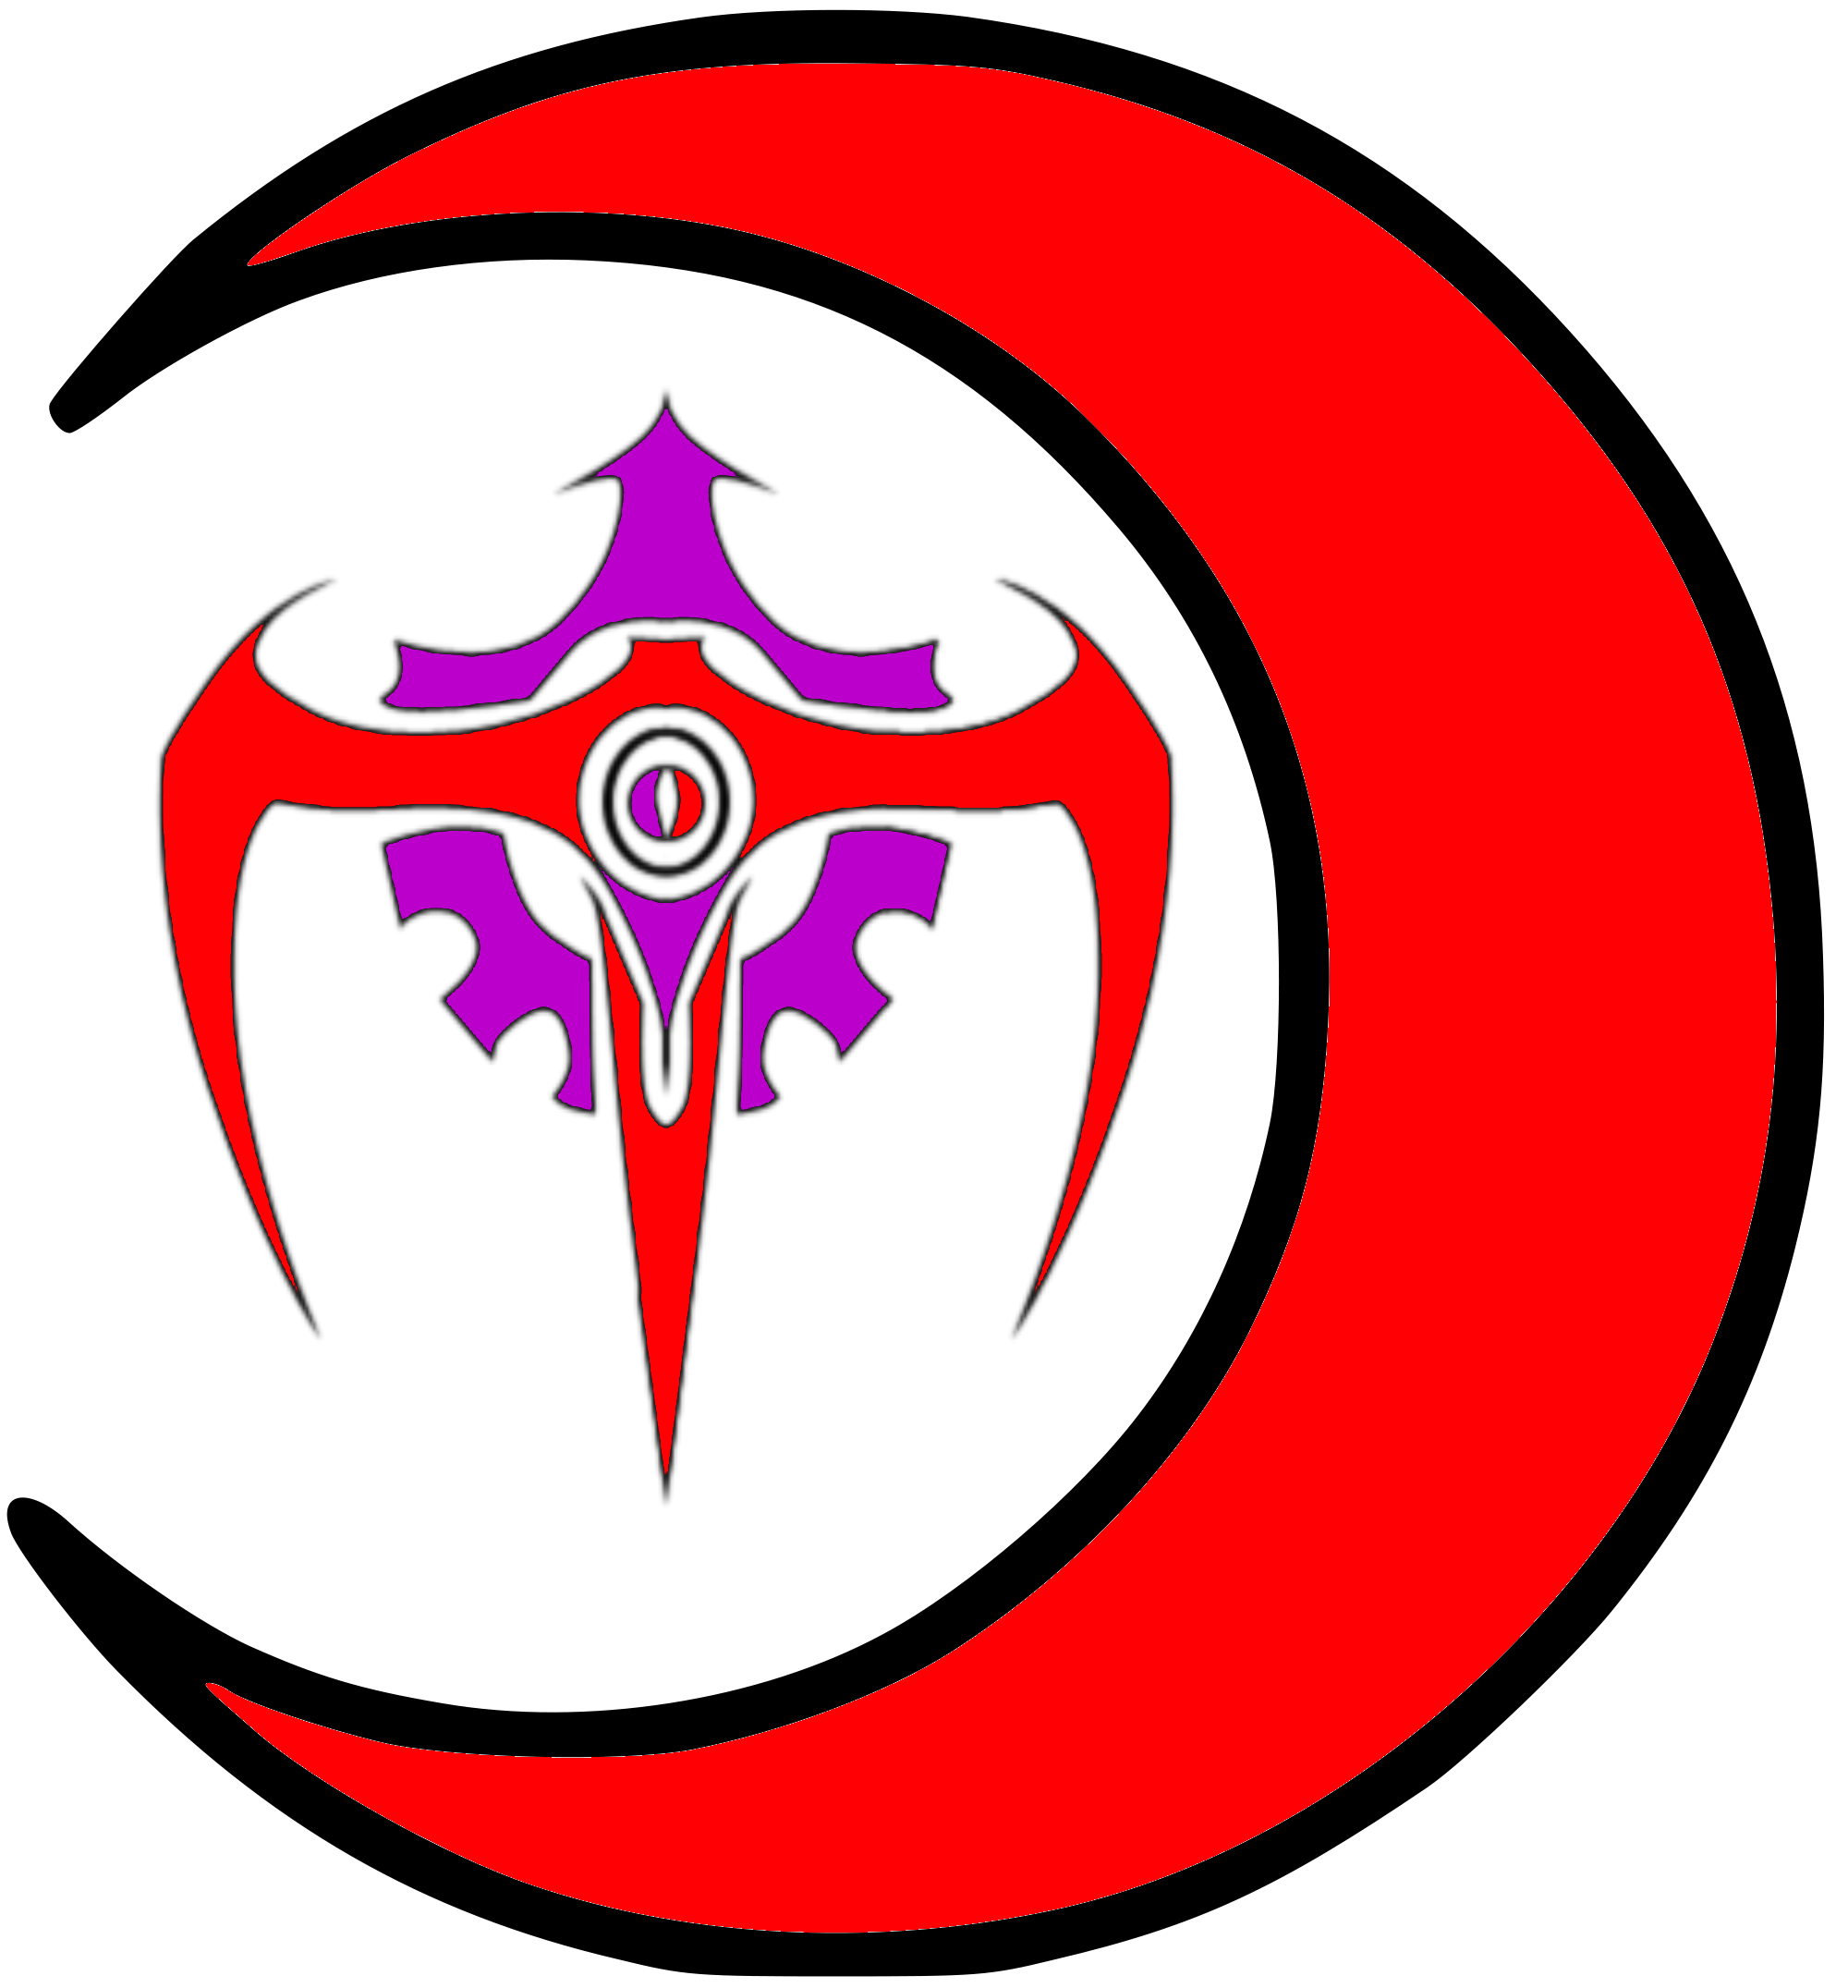 red moon symbolism - photo #5